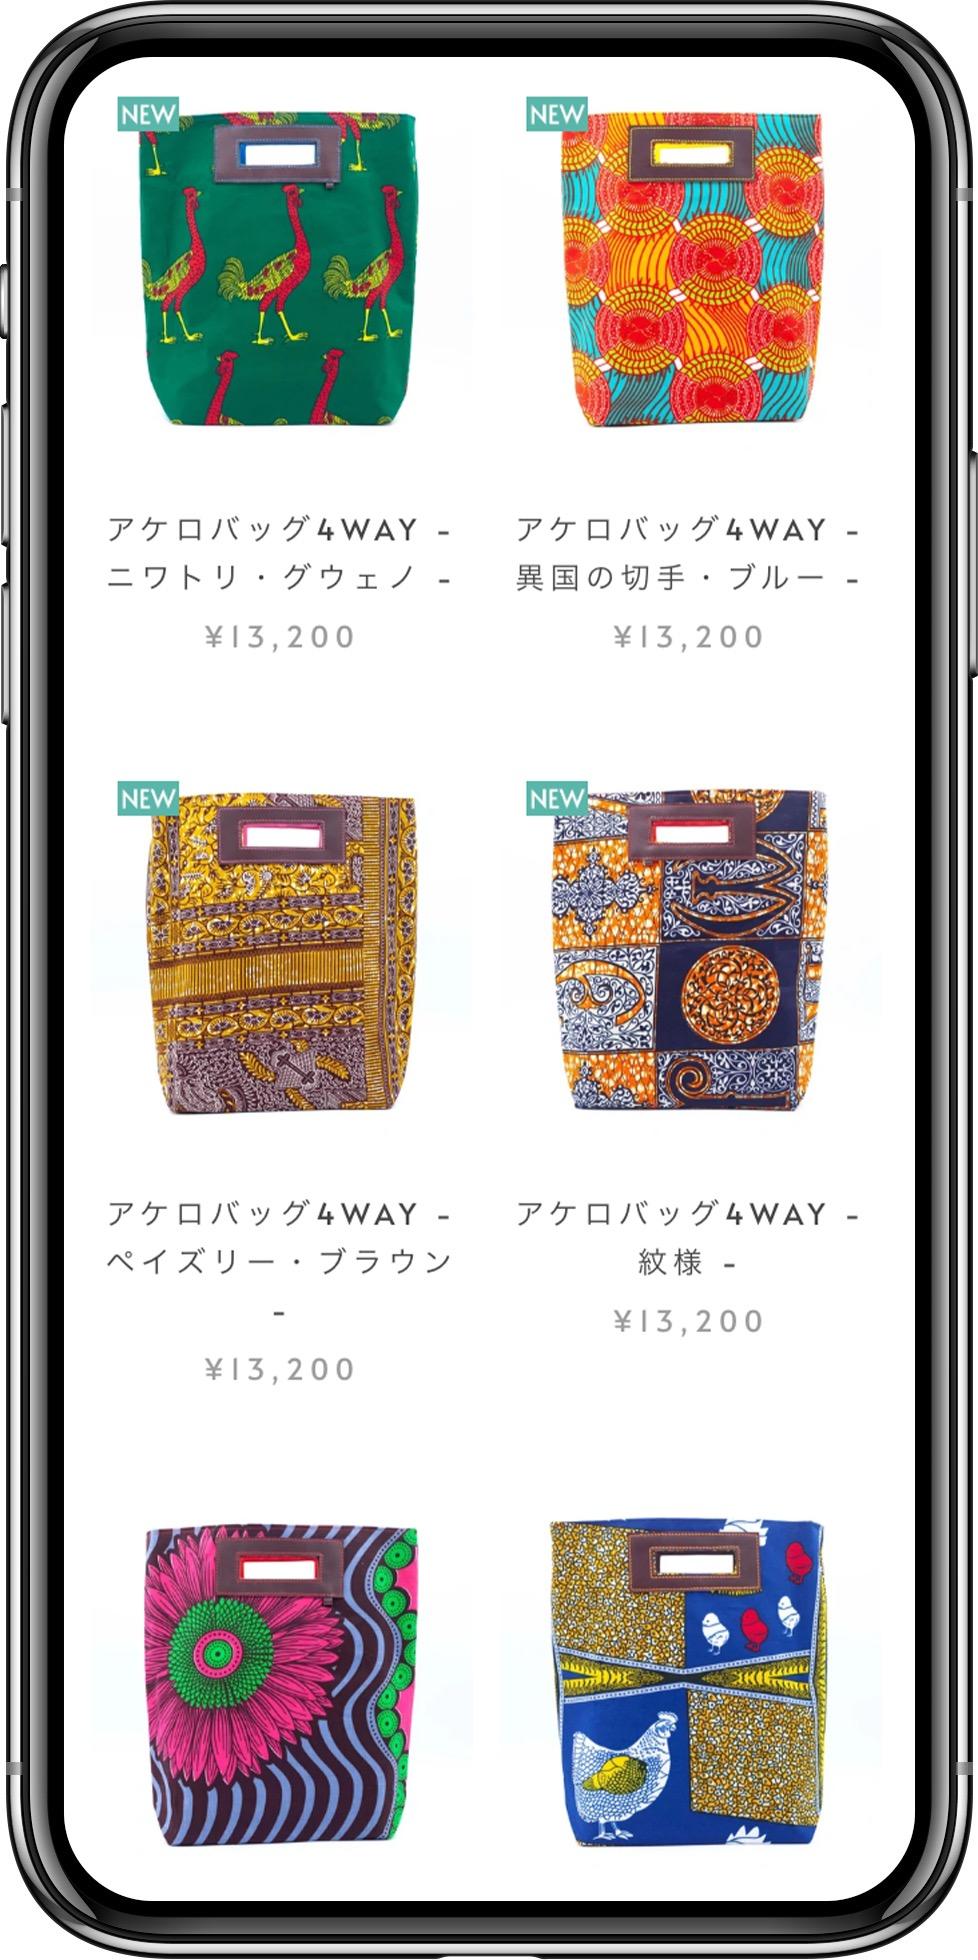 https://artpeace.jp/wp-content/uploads/2021/04/flame_sample-4.png